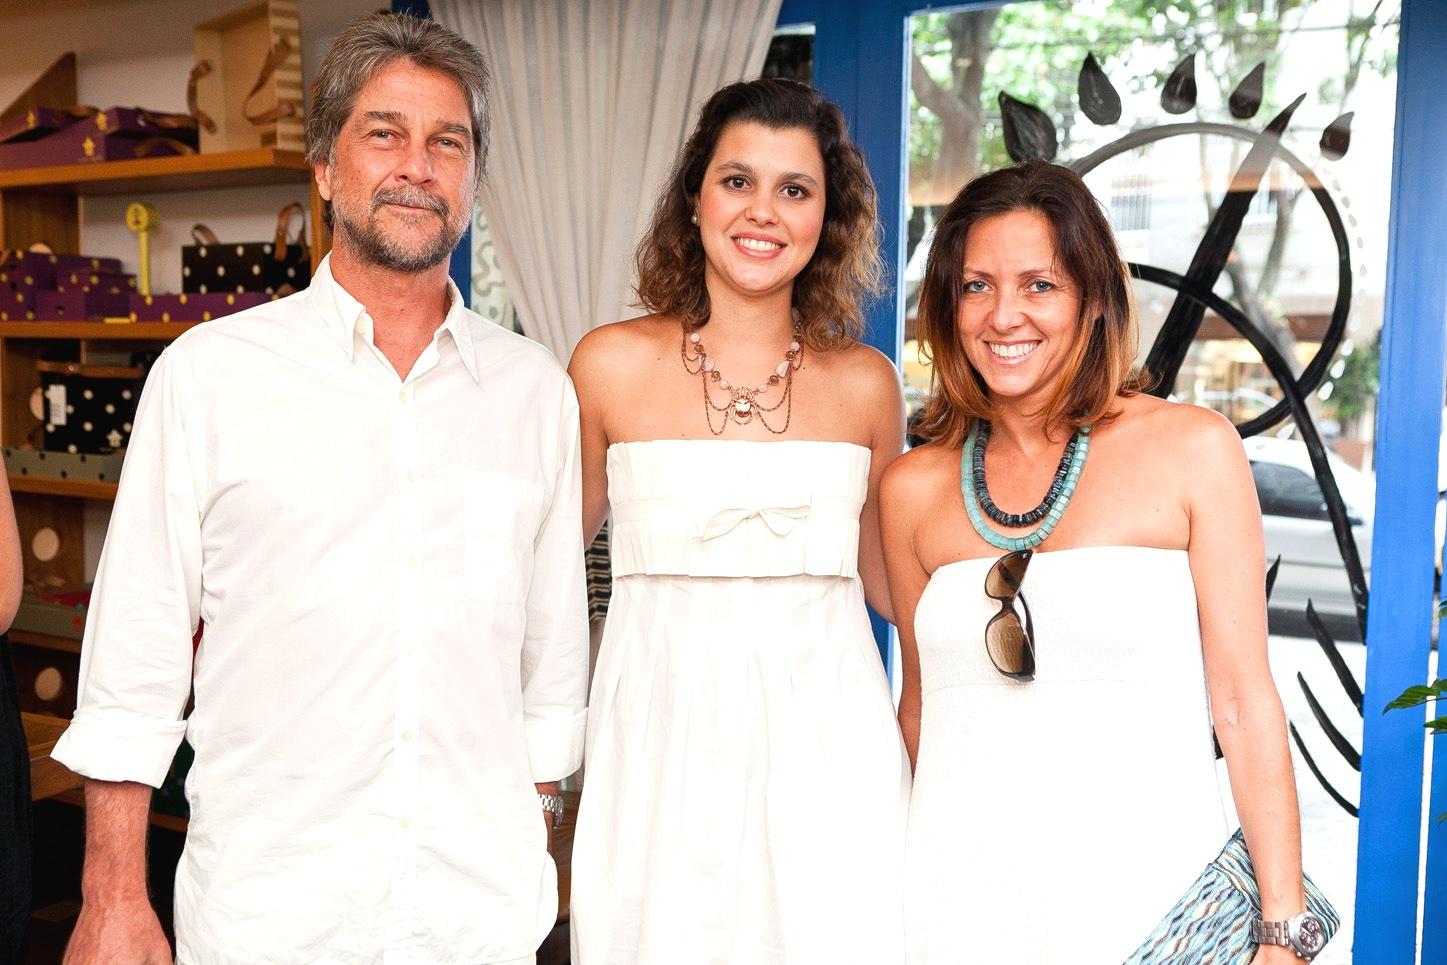 Angelica Sofia Saenz royalty & pomp: the family